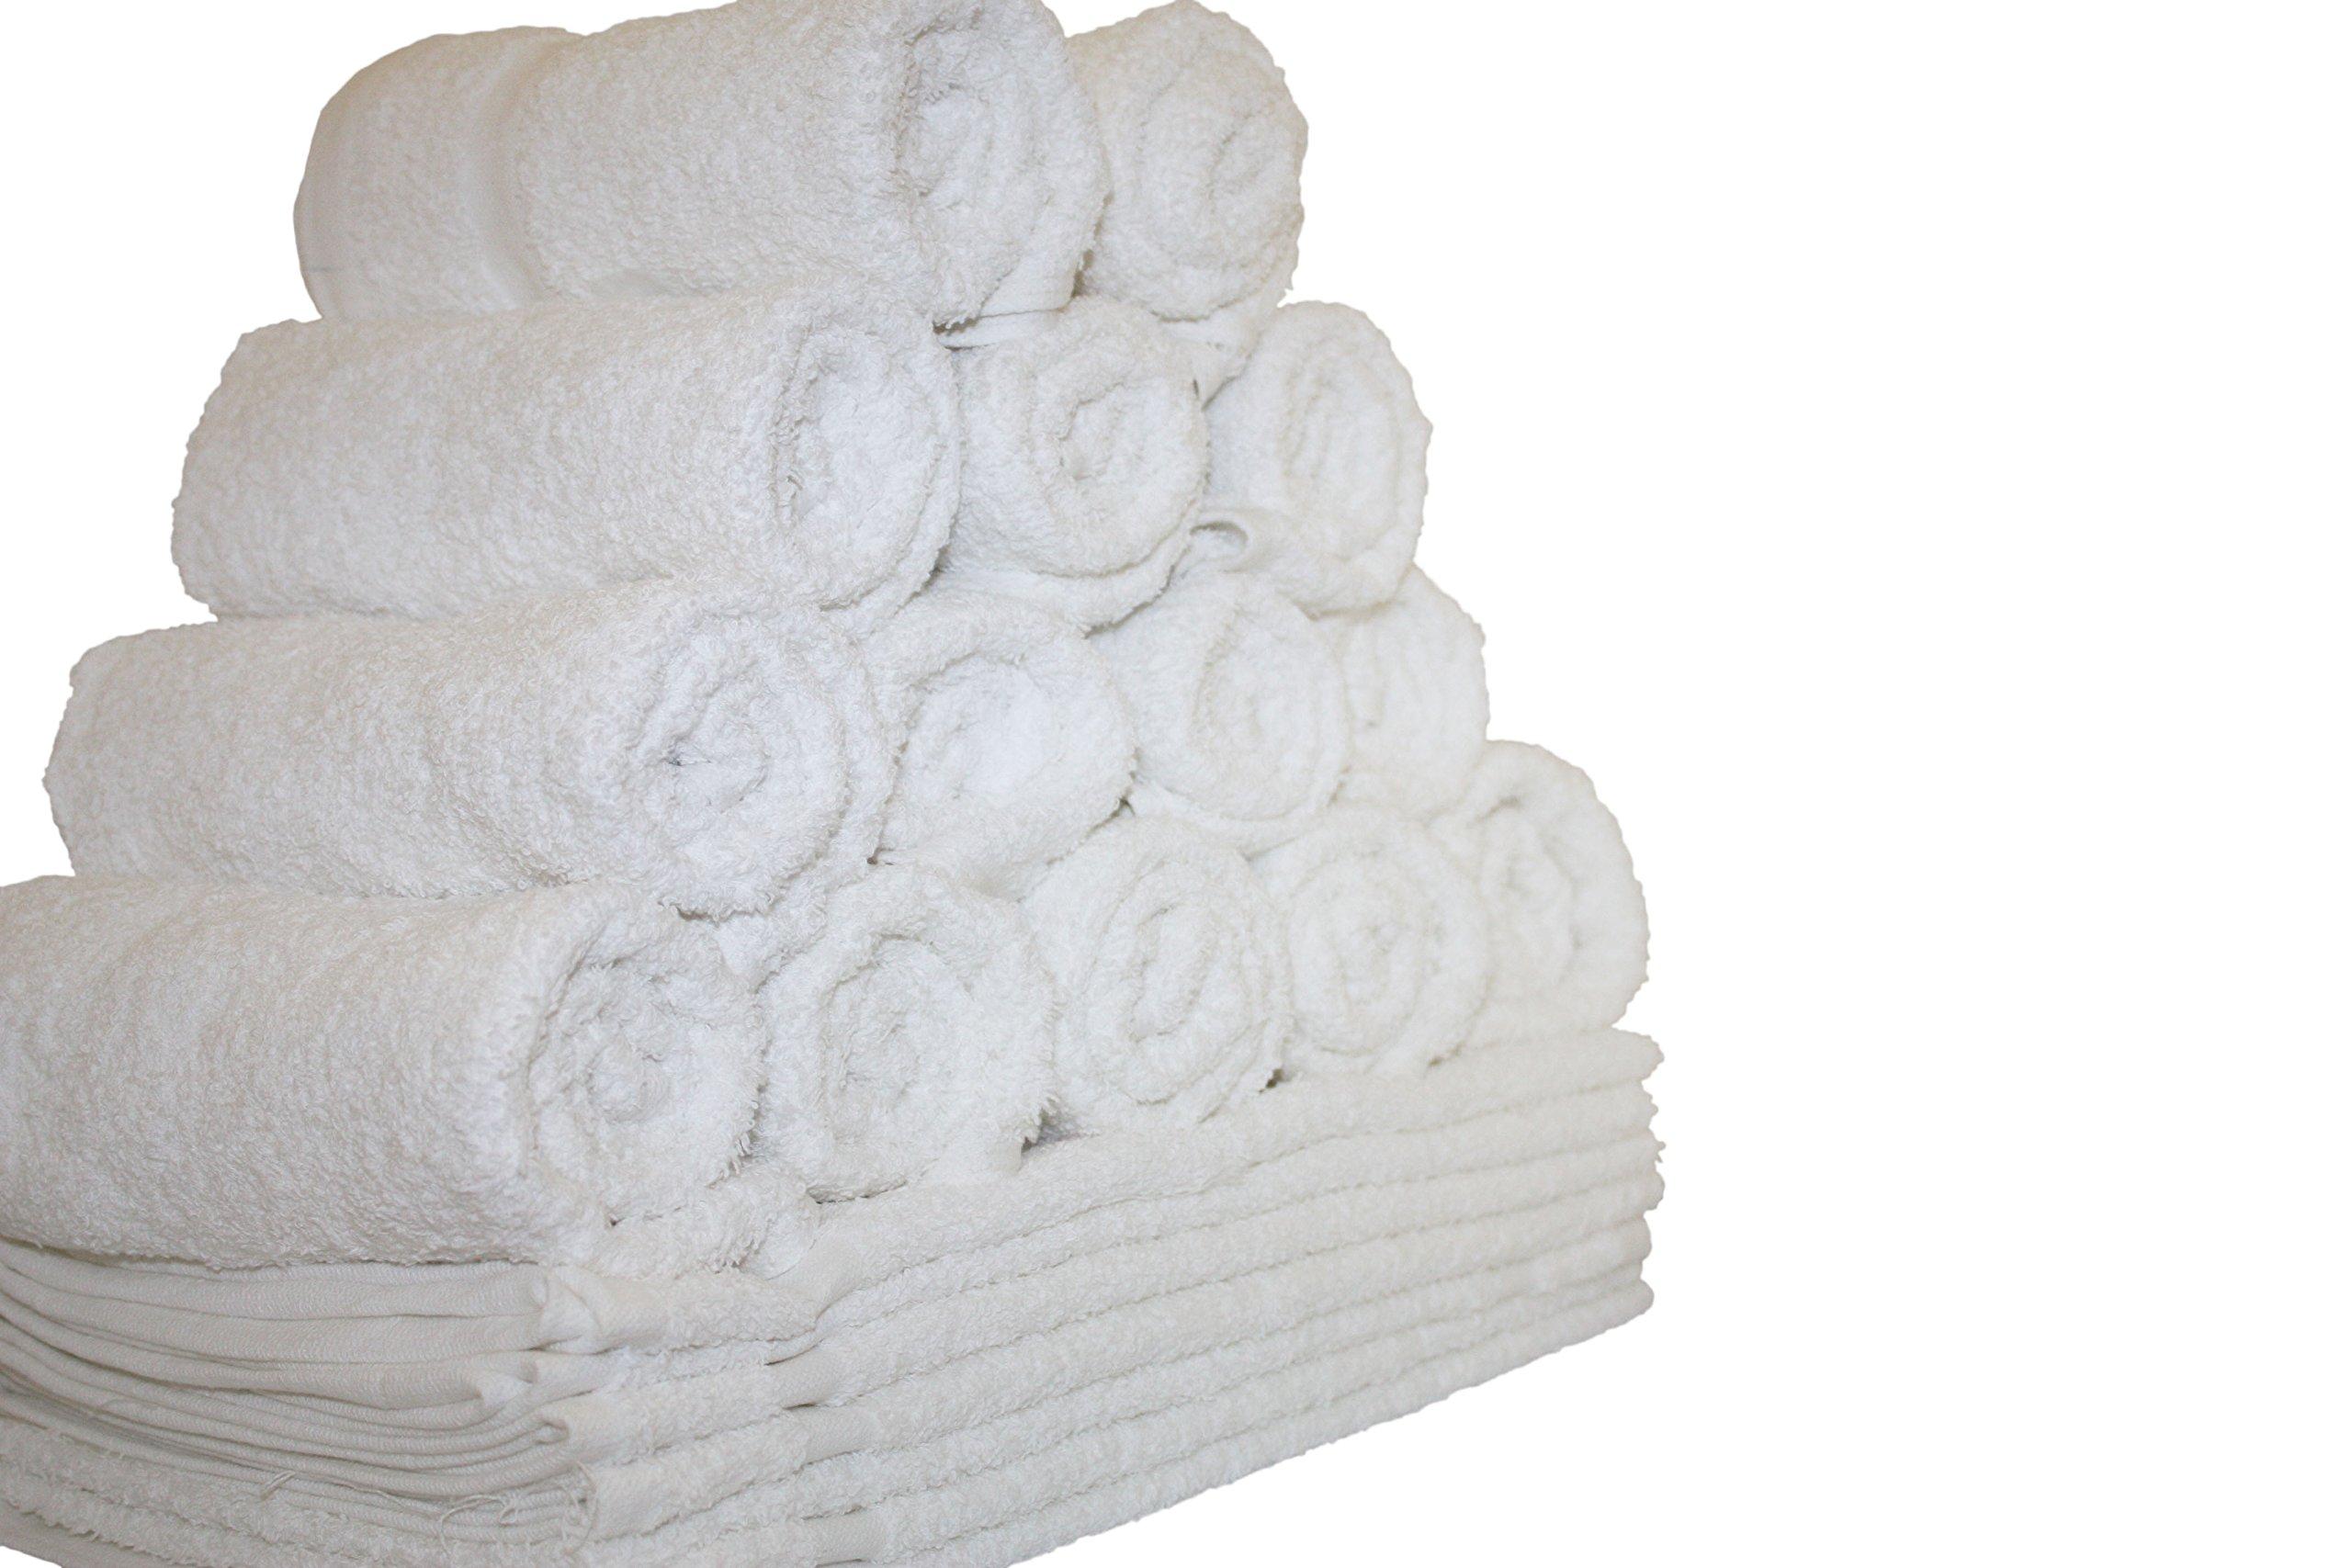 12-Pieces Salon Gym Spa Hand Ring Spun Towels, 16x27'' White Eco-Friendly 100% Cotton - by Atlas